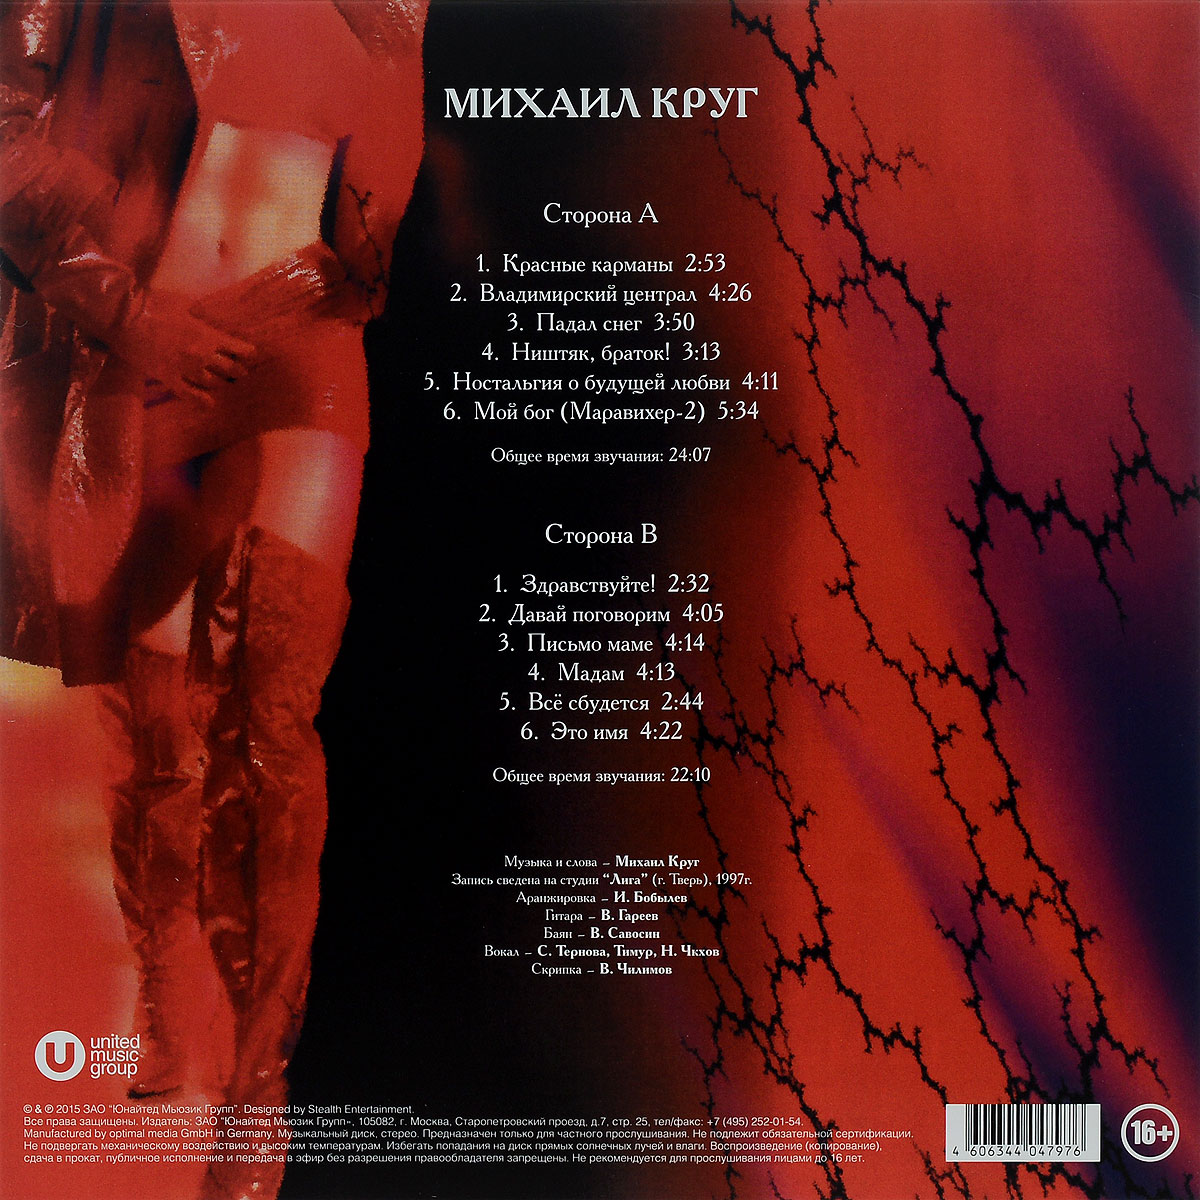 Михаил Круг.  Мадам (LP) Side 1:Tracks 1 - 6Side 2:Tracks -...